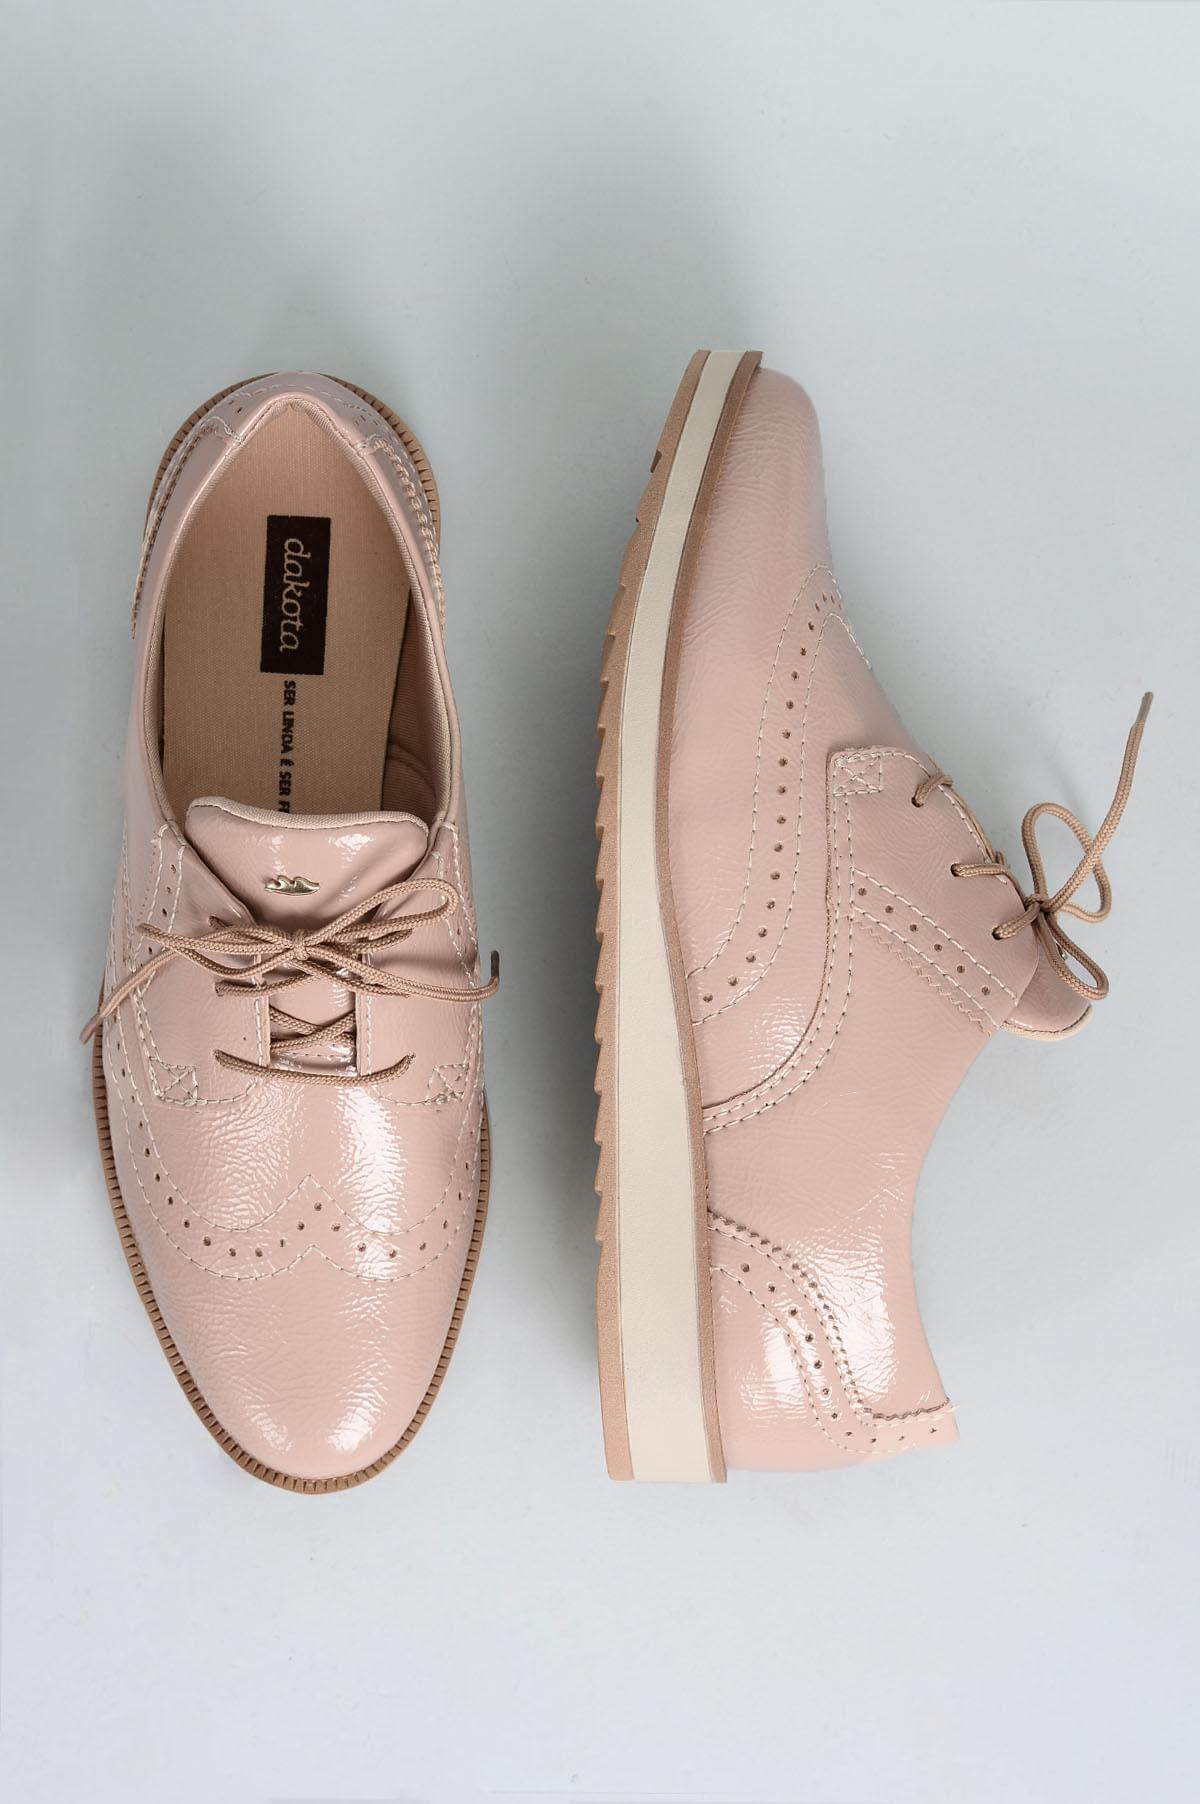 5c4c6290f Oxford Feminino Dilan Dakota VERNIZ - NUDE - Mundial Calçados